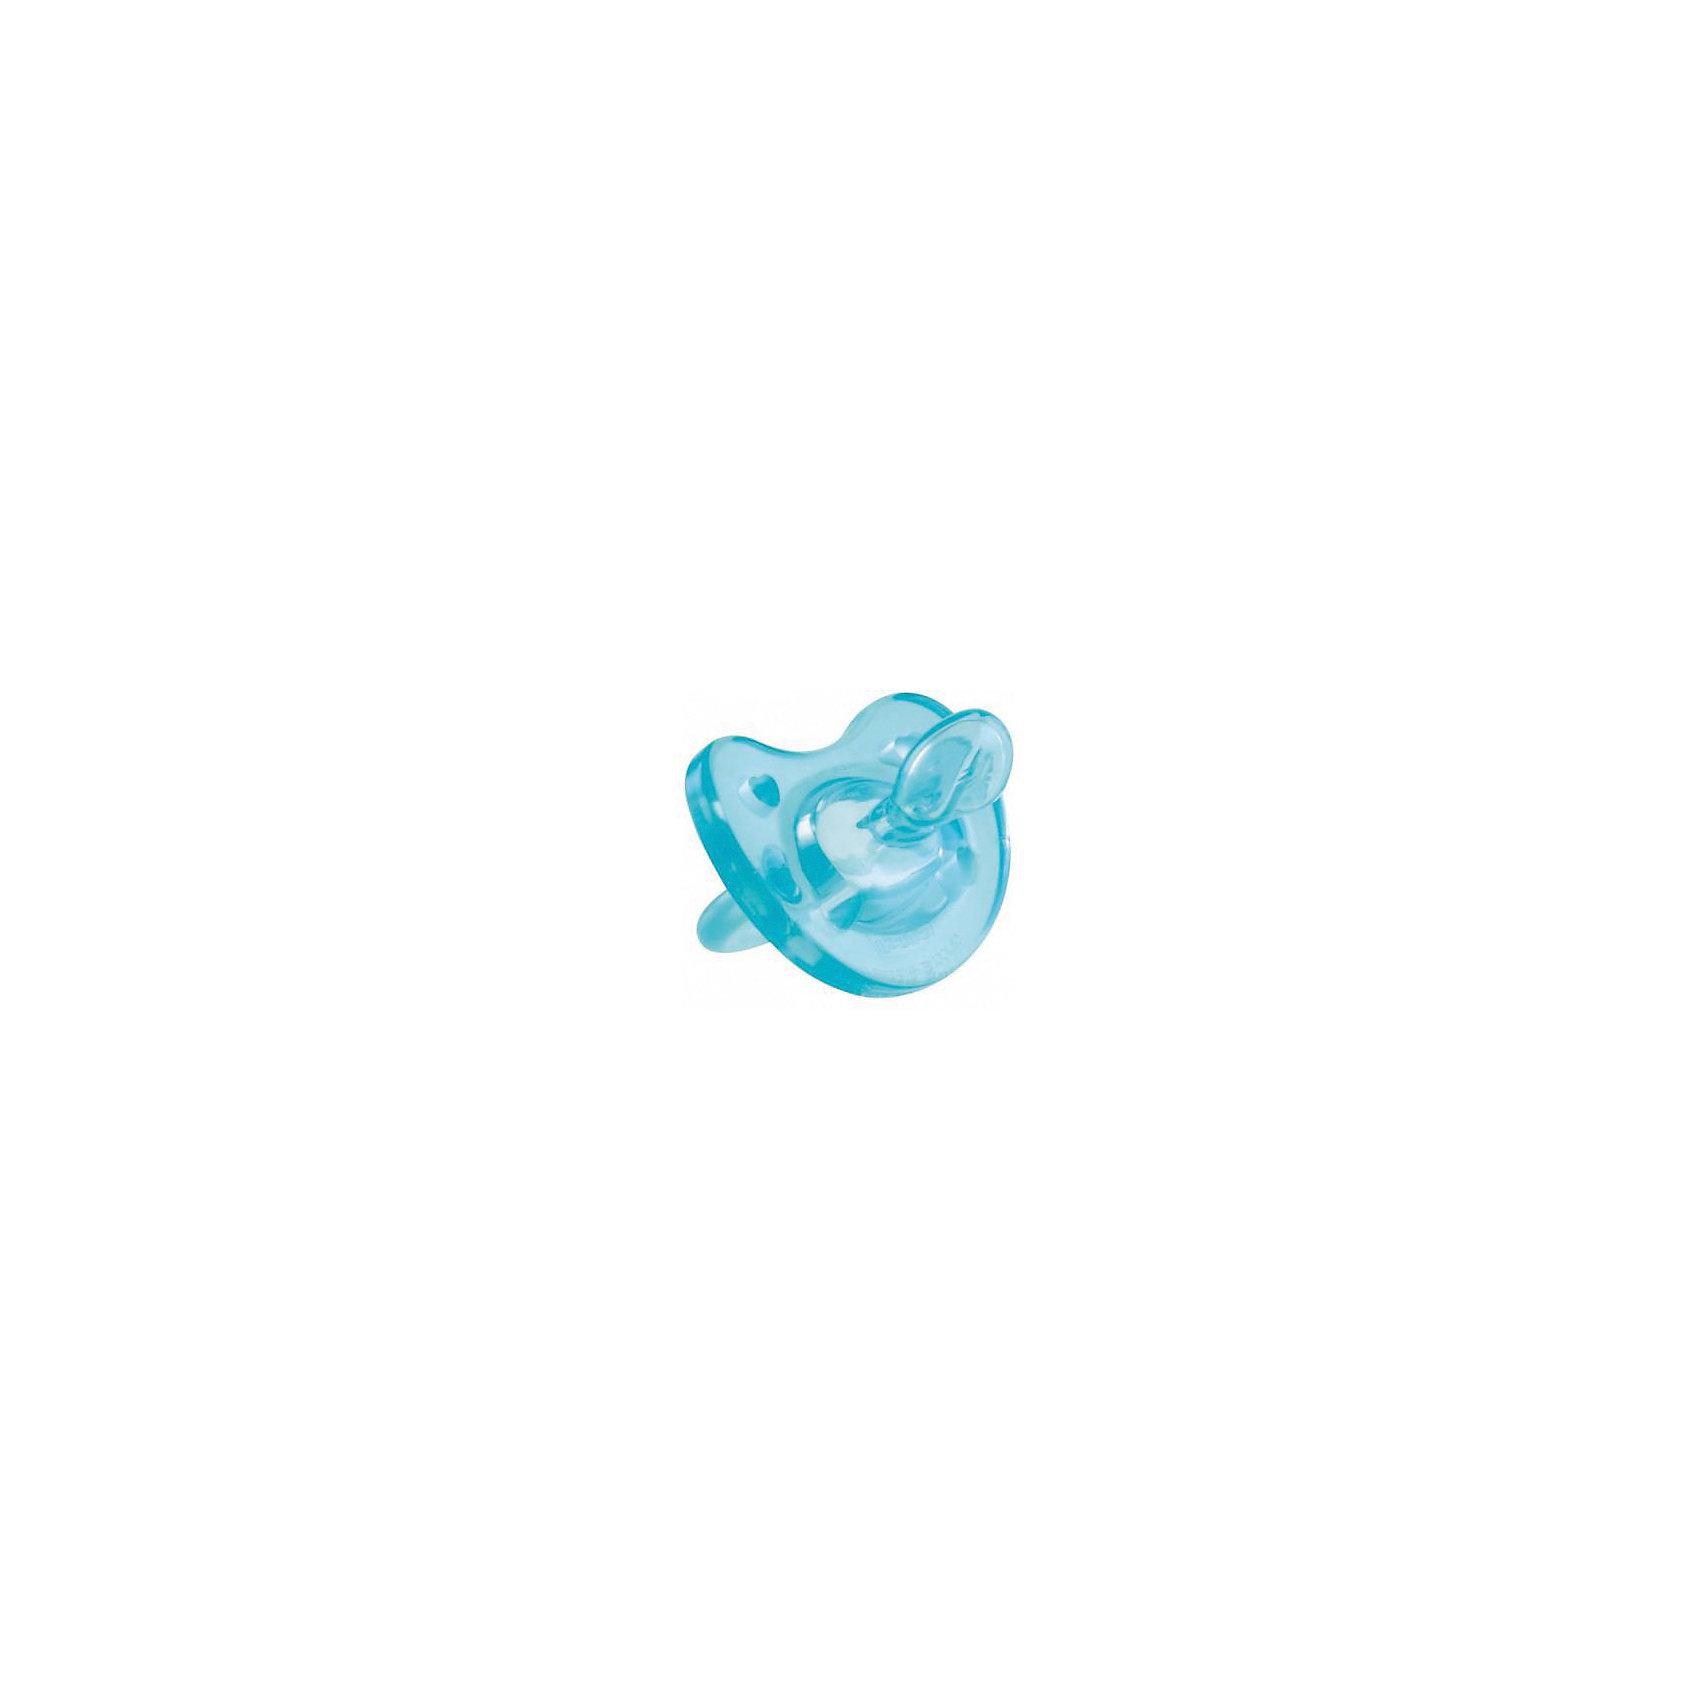 CHICCO Силиконовая пустышка Physio Soft 0-6мес., CHICCO, голубой пустышка силиконовая дизайн 0 6мес уп 2шт